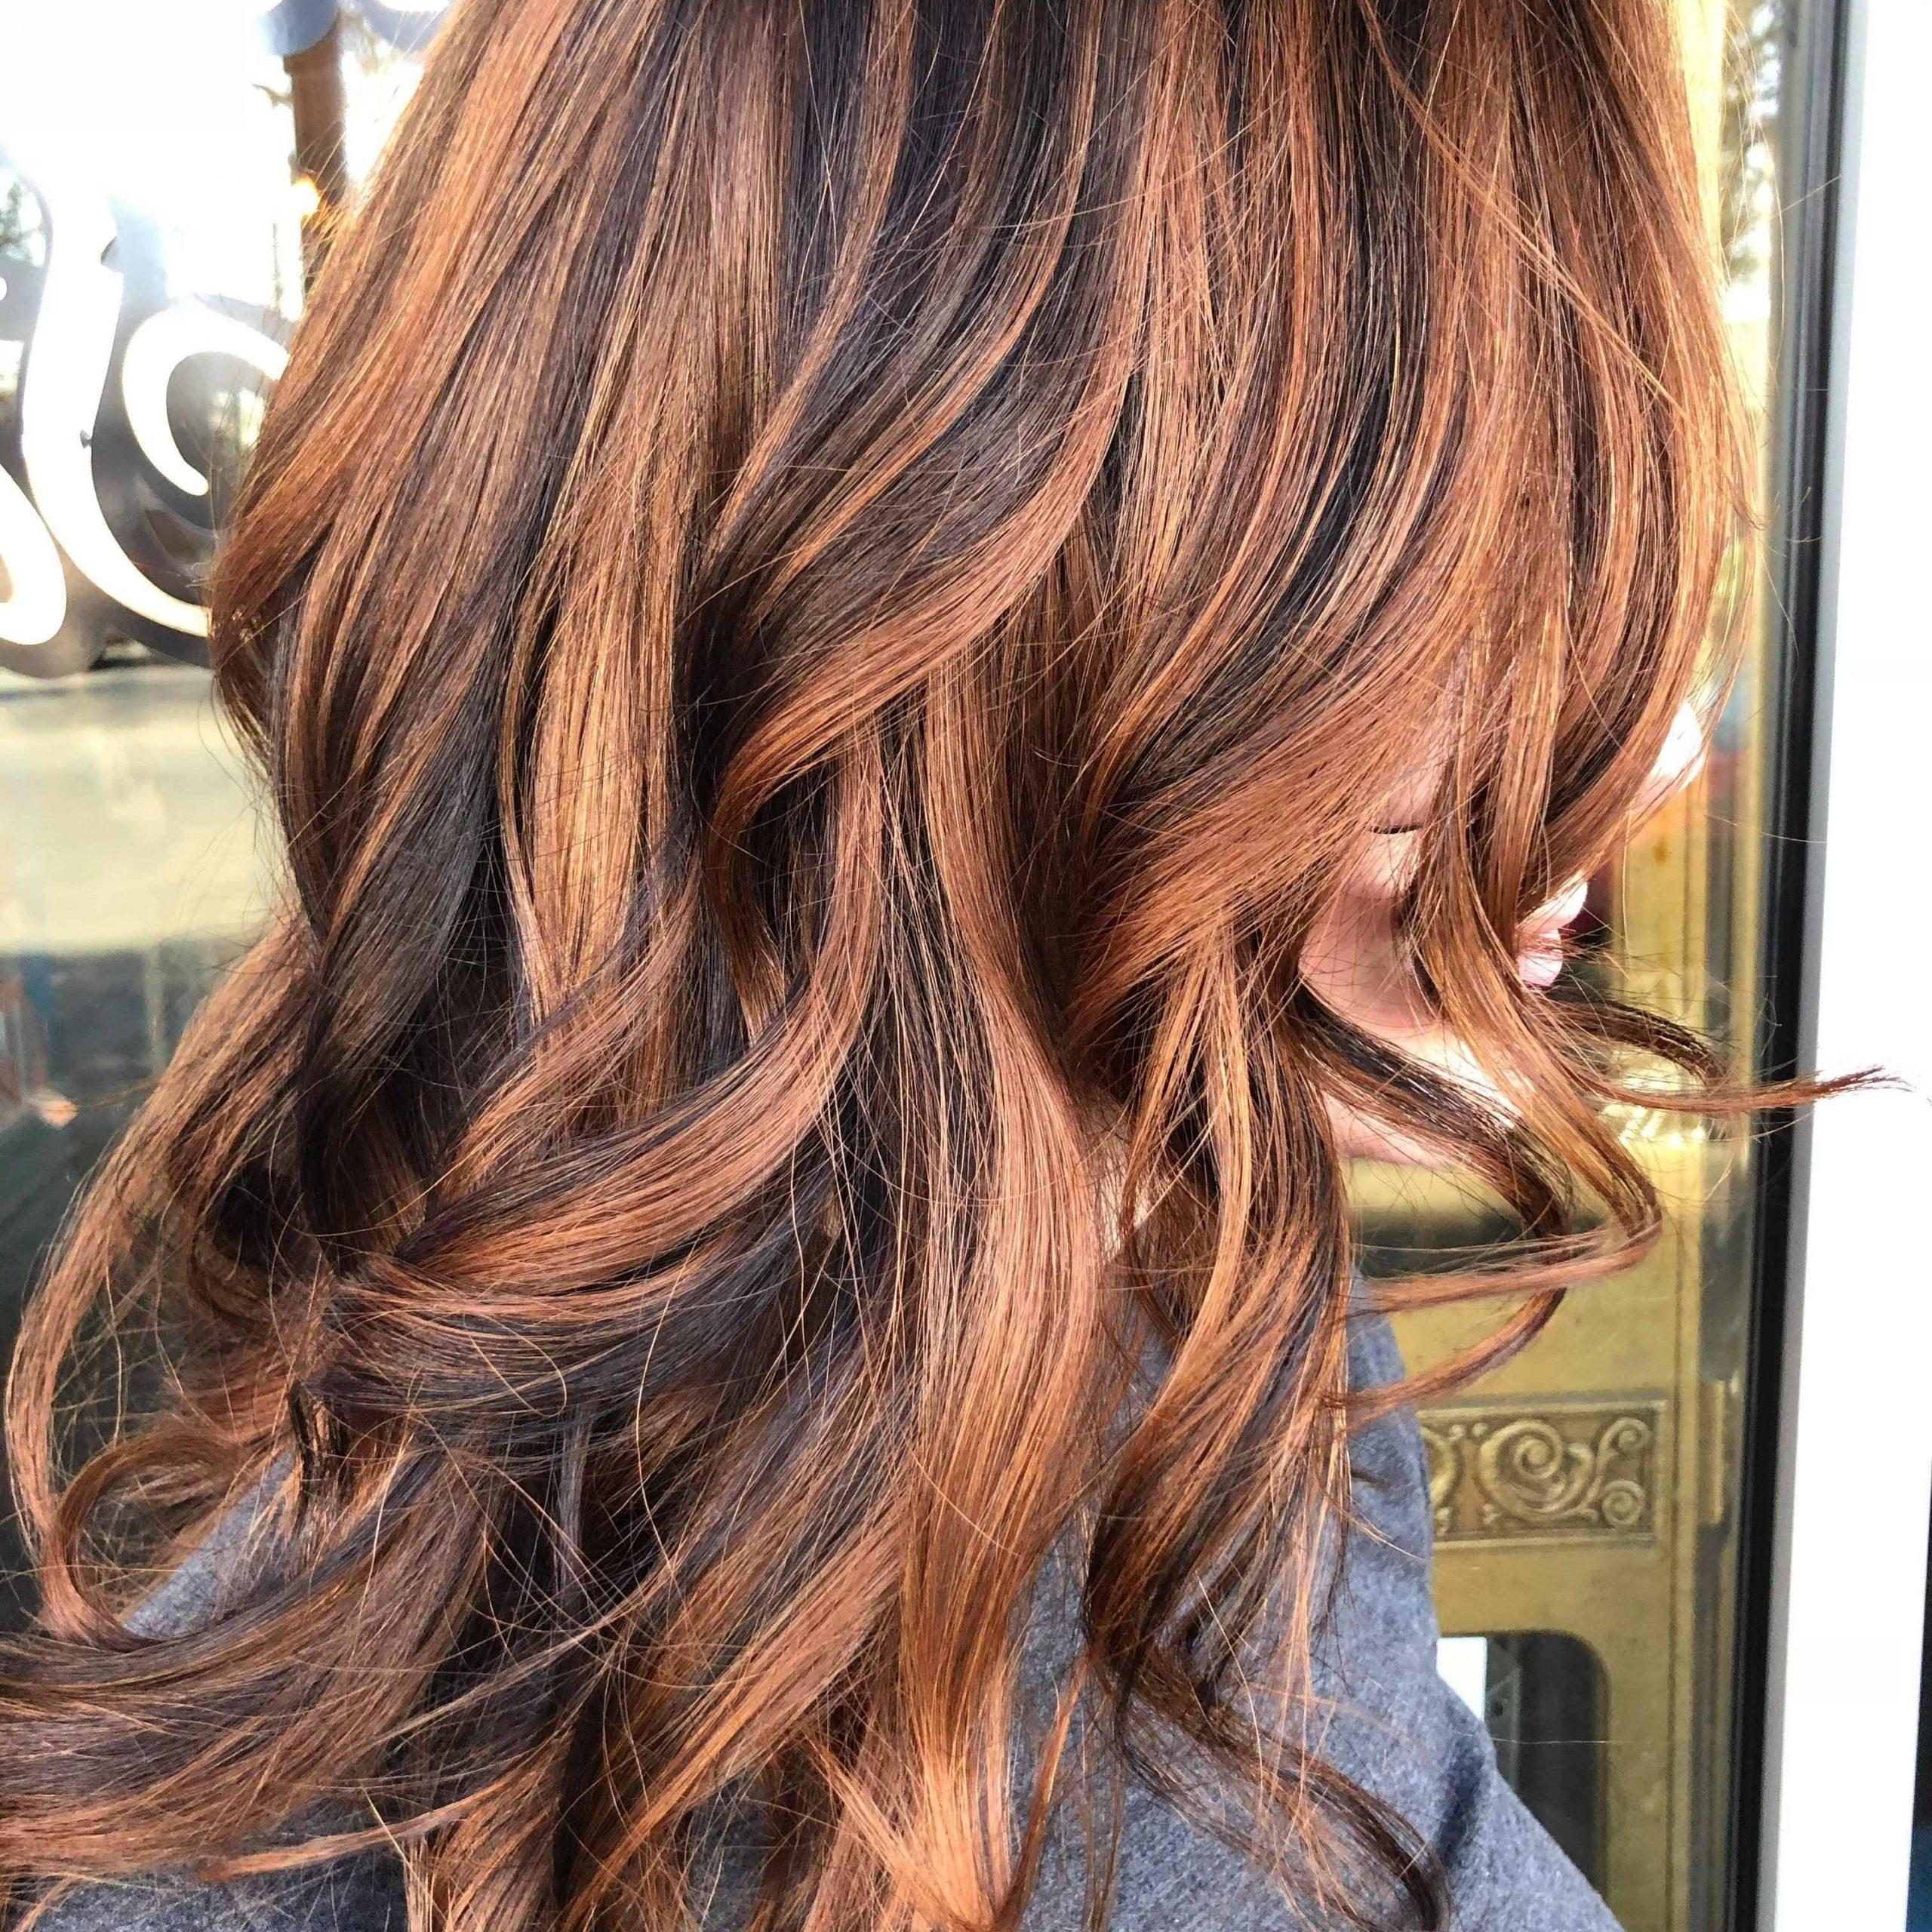 Natural Redhead With Dark Brown Lowlight Balayage Within Natural Looking Dark Blonde Balayage Hairstyles (View 10 of 20)